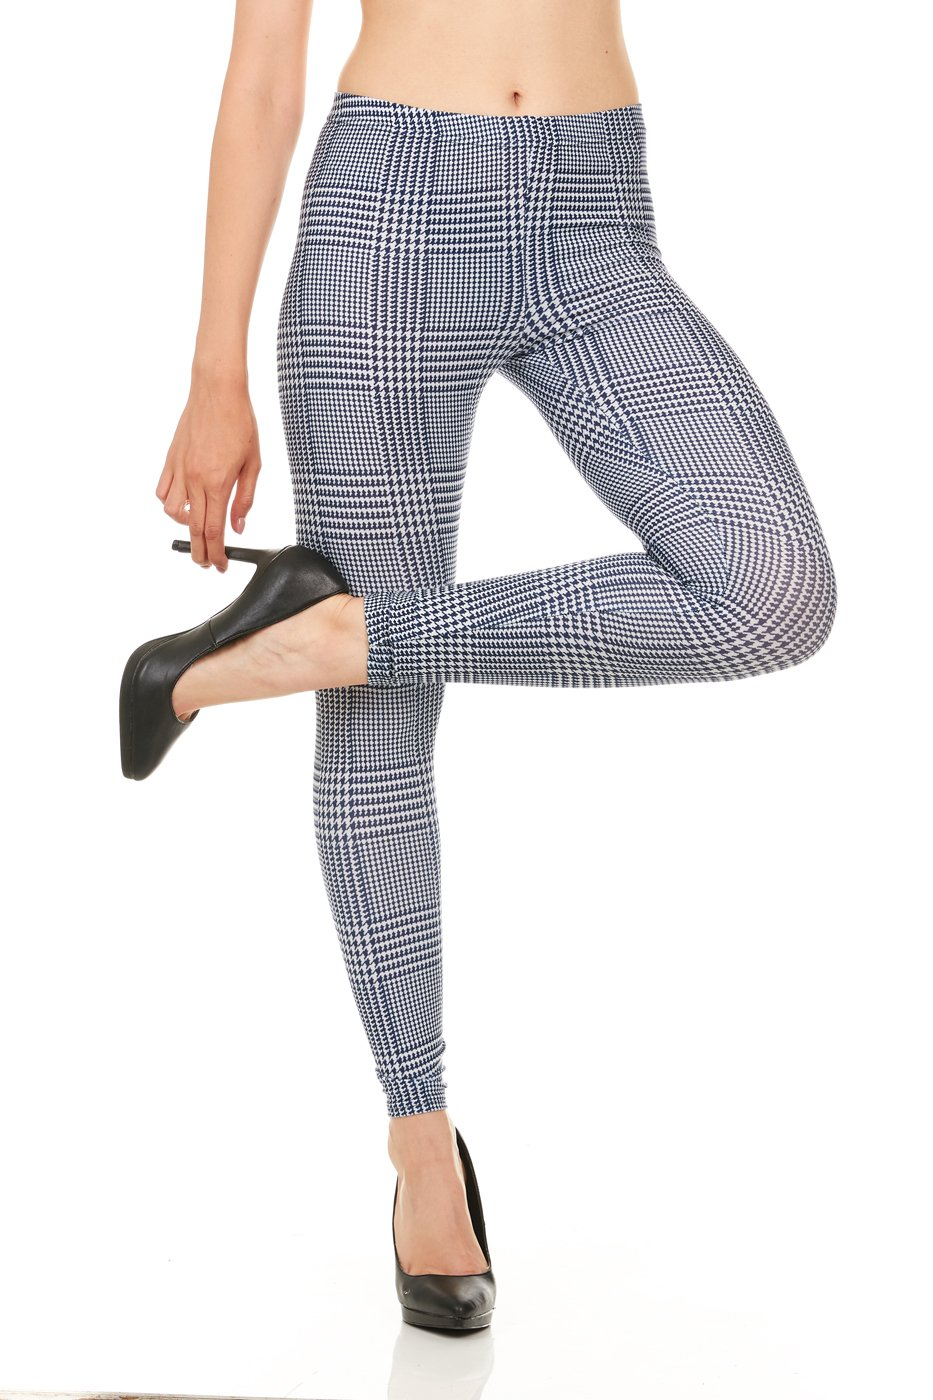 Carnival Women's Full-Length Printed Soft Microfiber Legging, Blue Menswear, X-Large